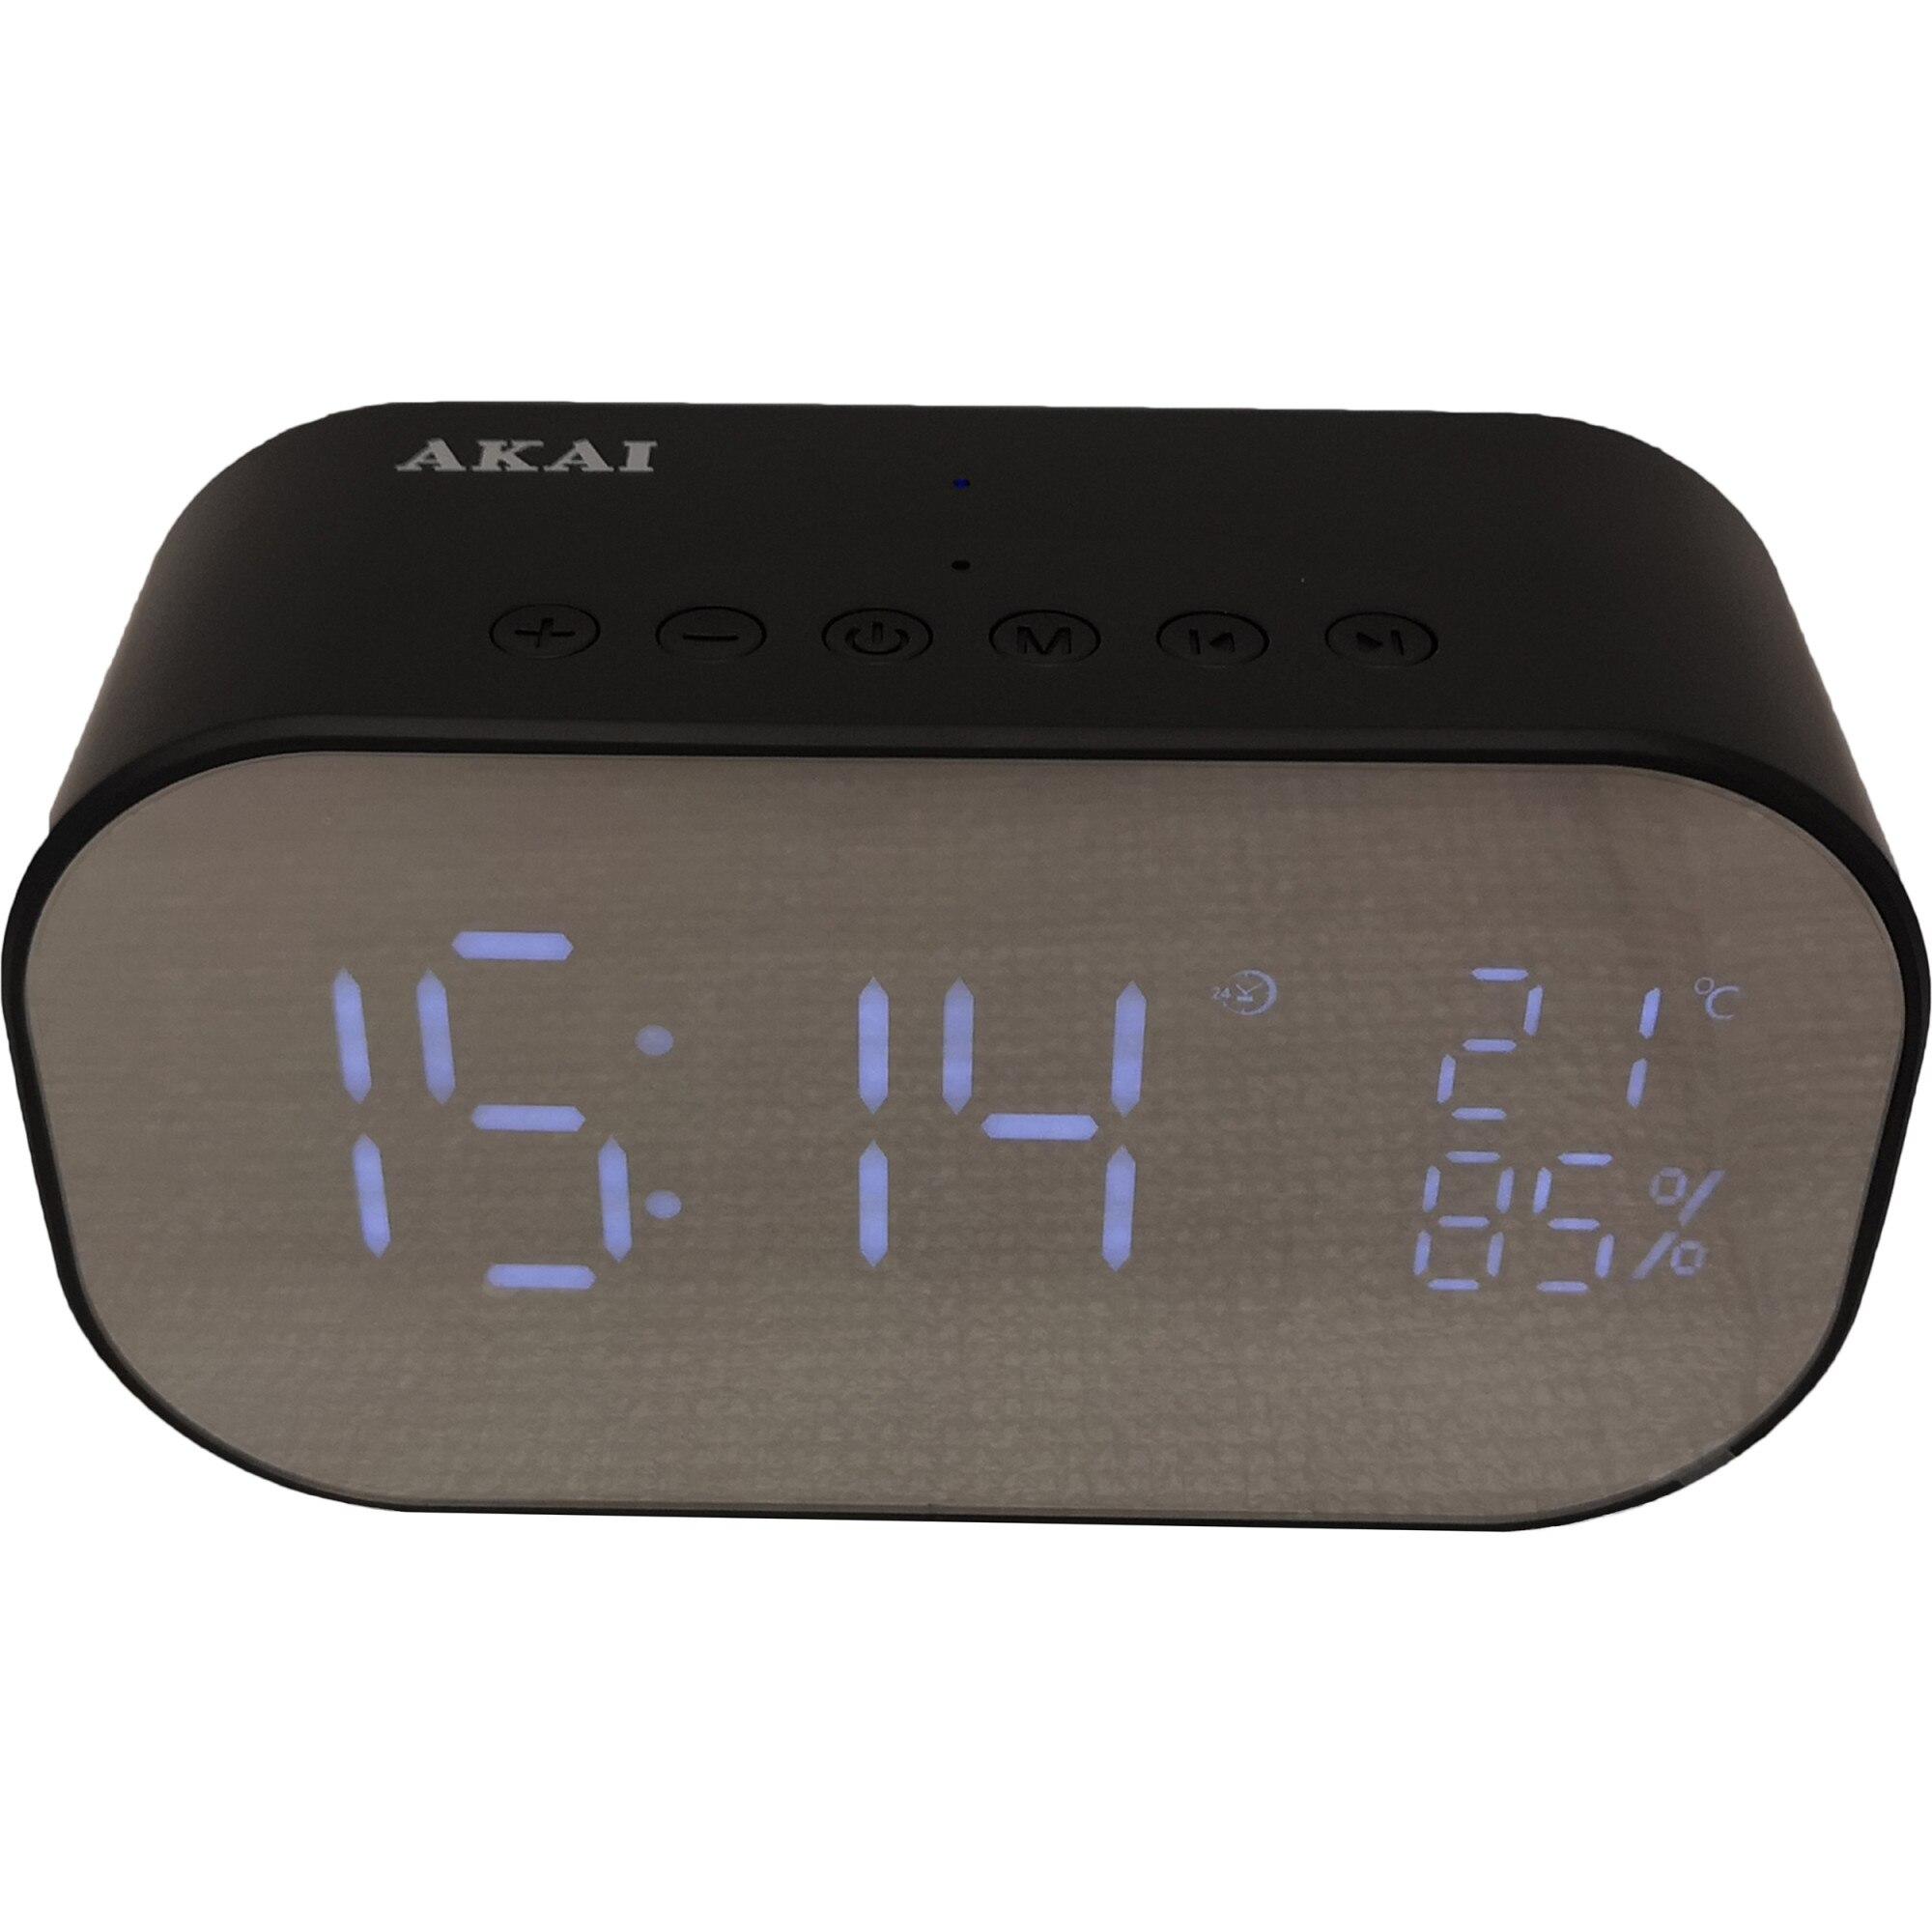 Fotografie Radio ceas Akai ABTS-S2 cu BT, radio FM, carcasa aluminiu, baterie 1800 mAh, Negru